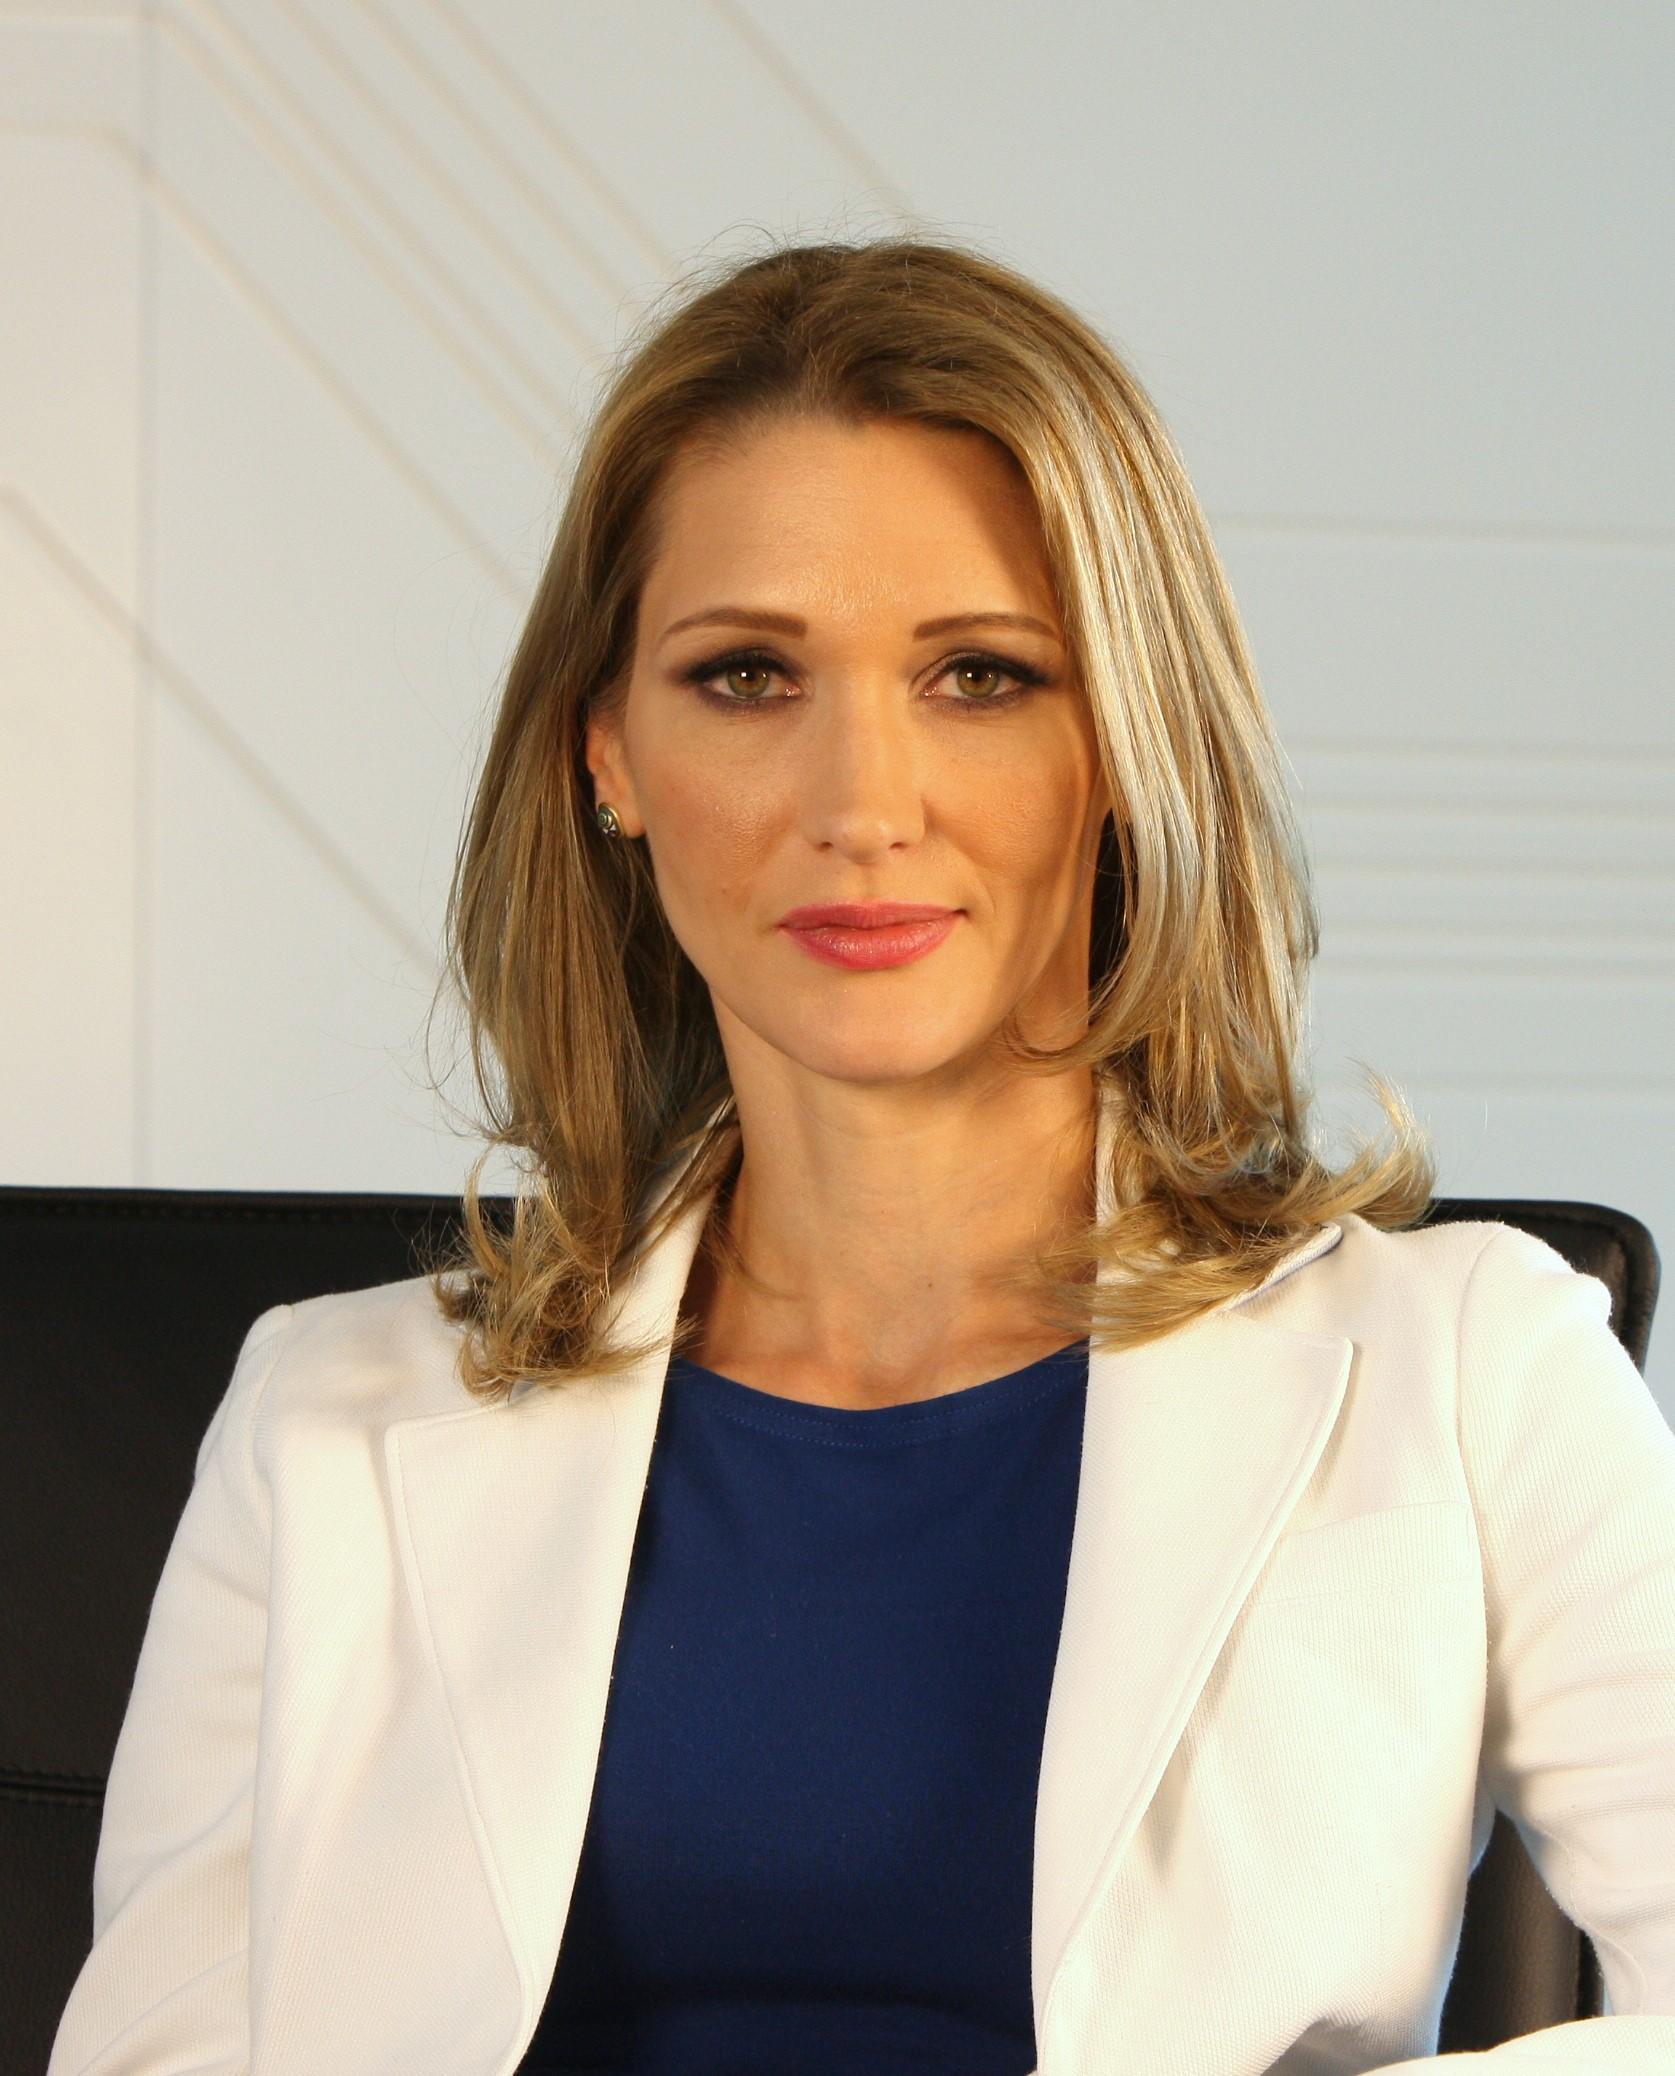 AlinaGeorgescu